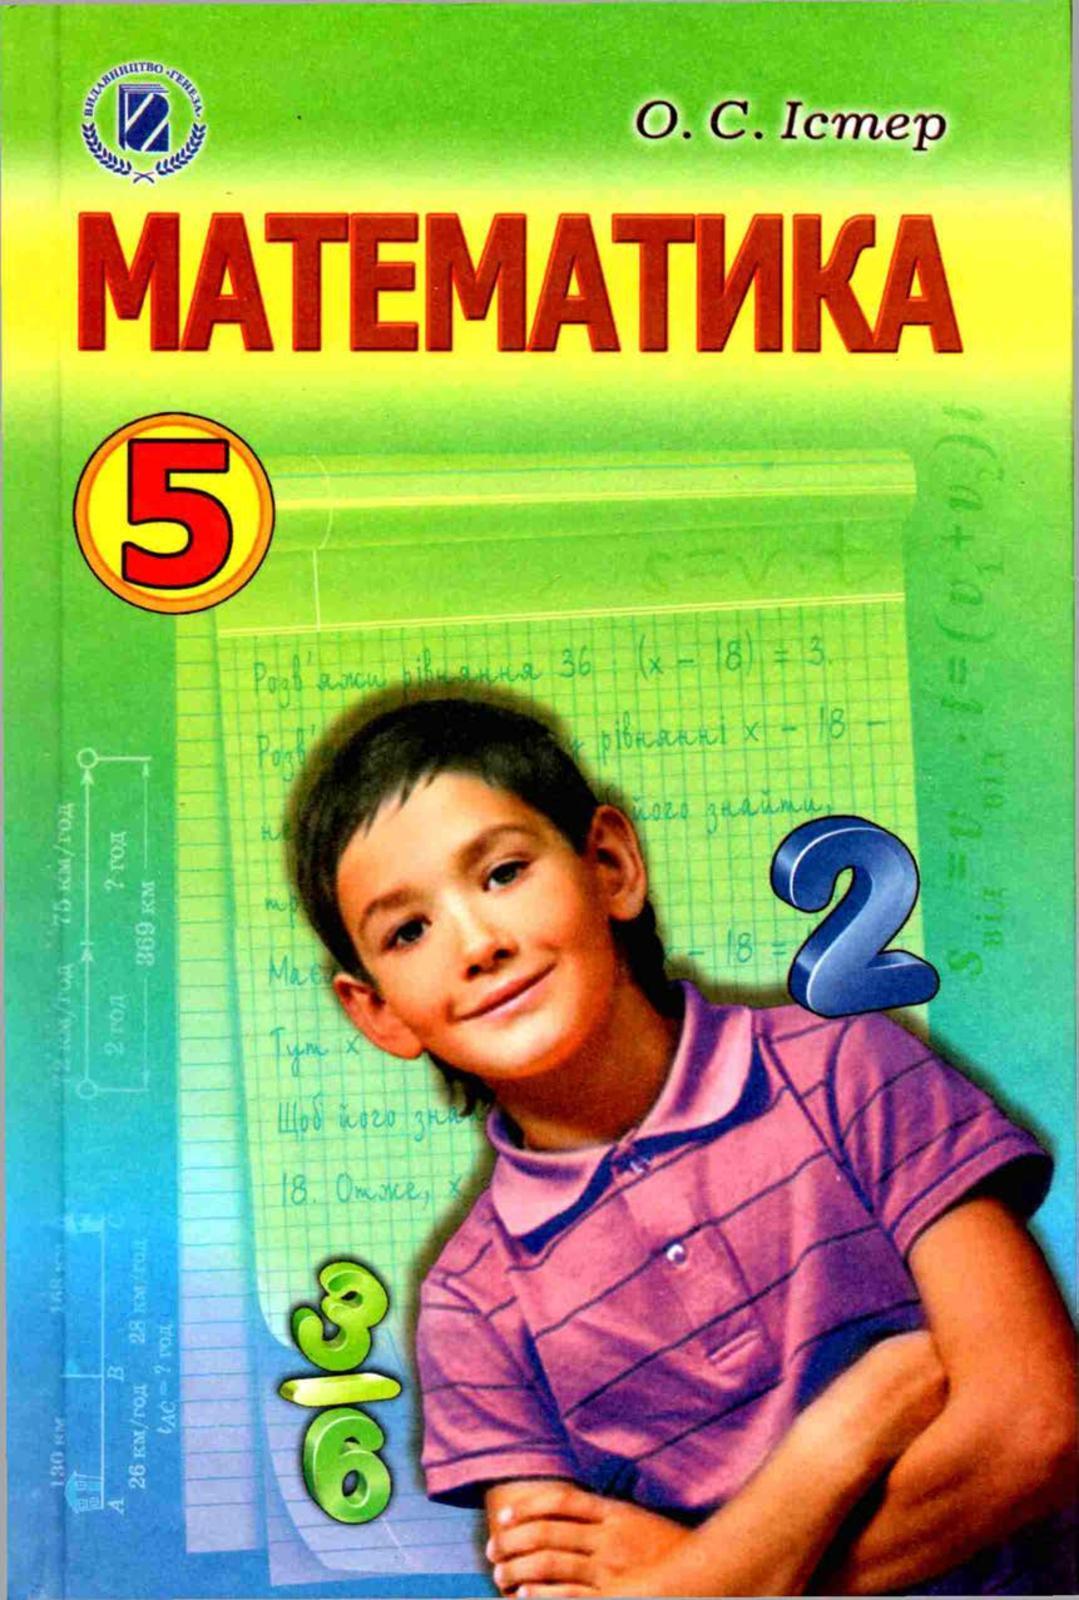 Calaméo - 5 клас. Математика (Істер) - 2013 2980bec90c33b